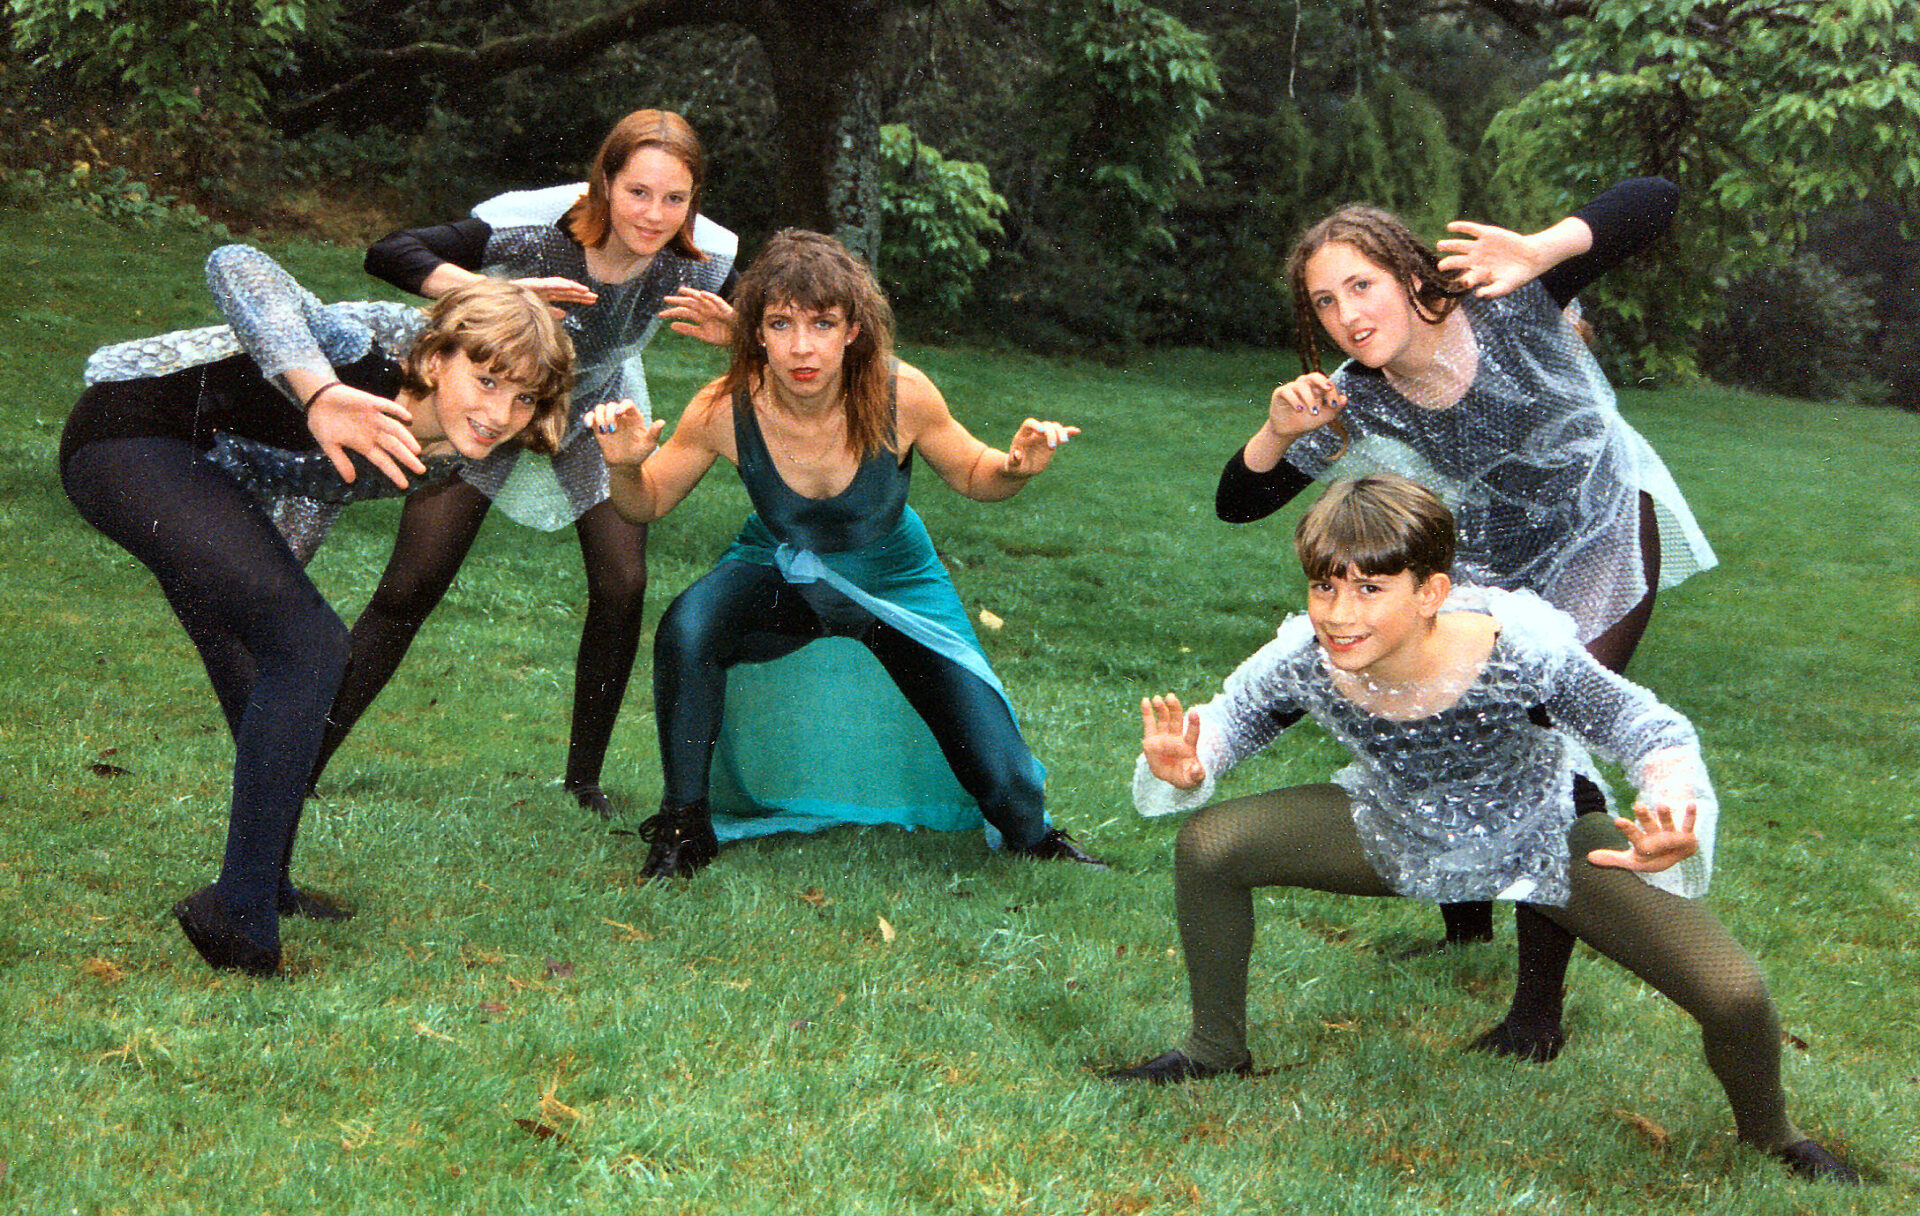 Goliards Midsummer Night's Dream,  with faeries, Anna, Megan, Pru, Danielle   & Gabriel (?)